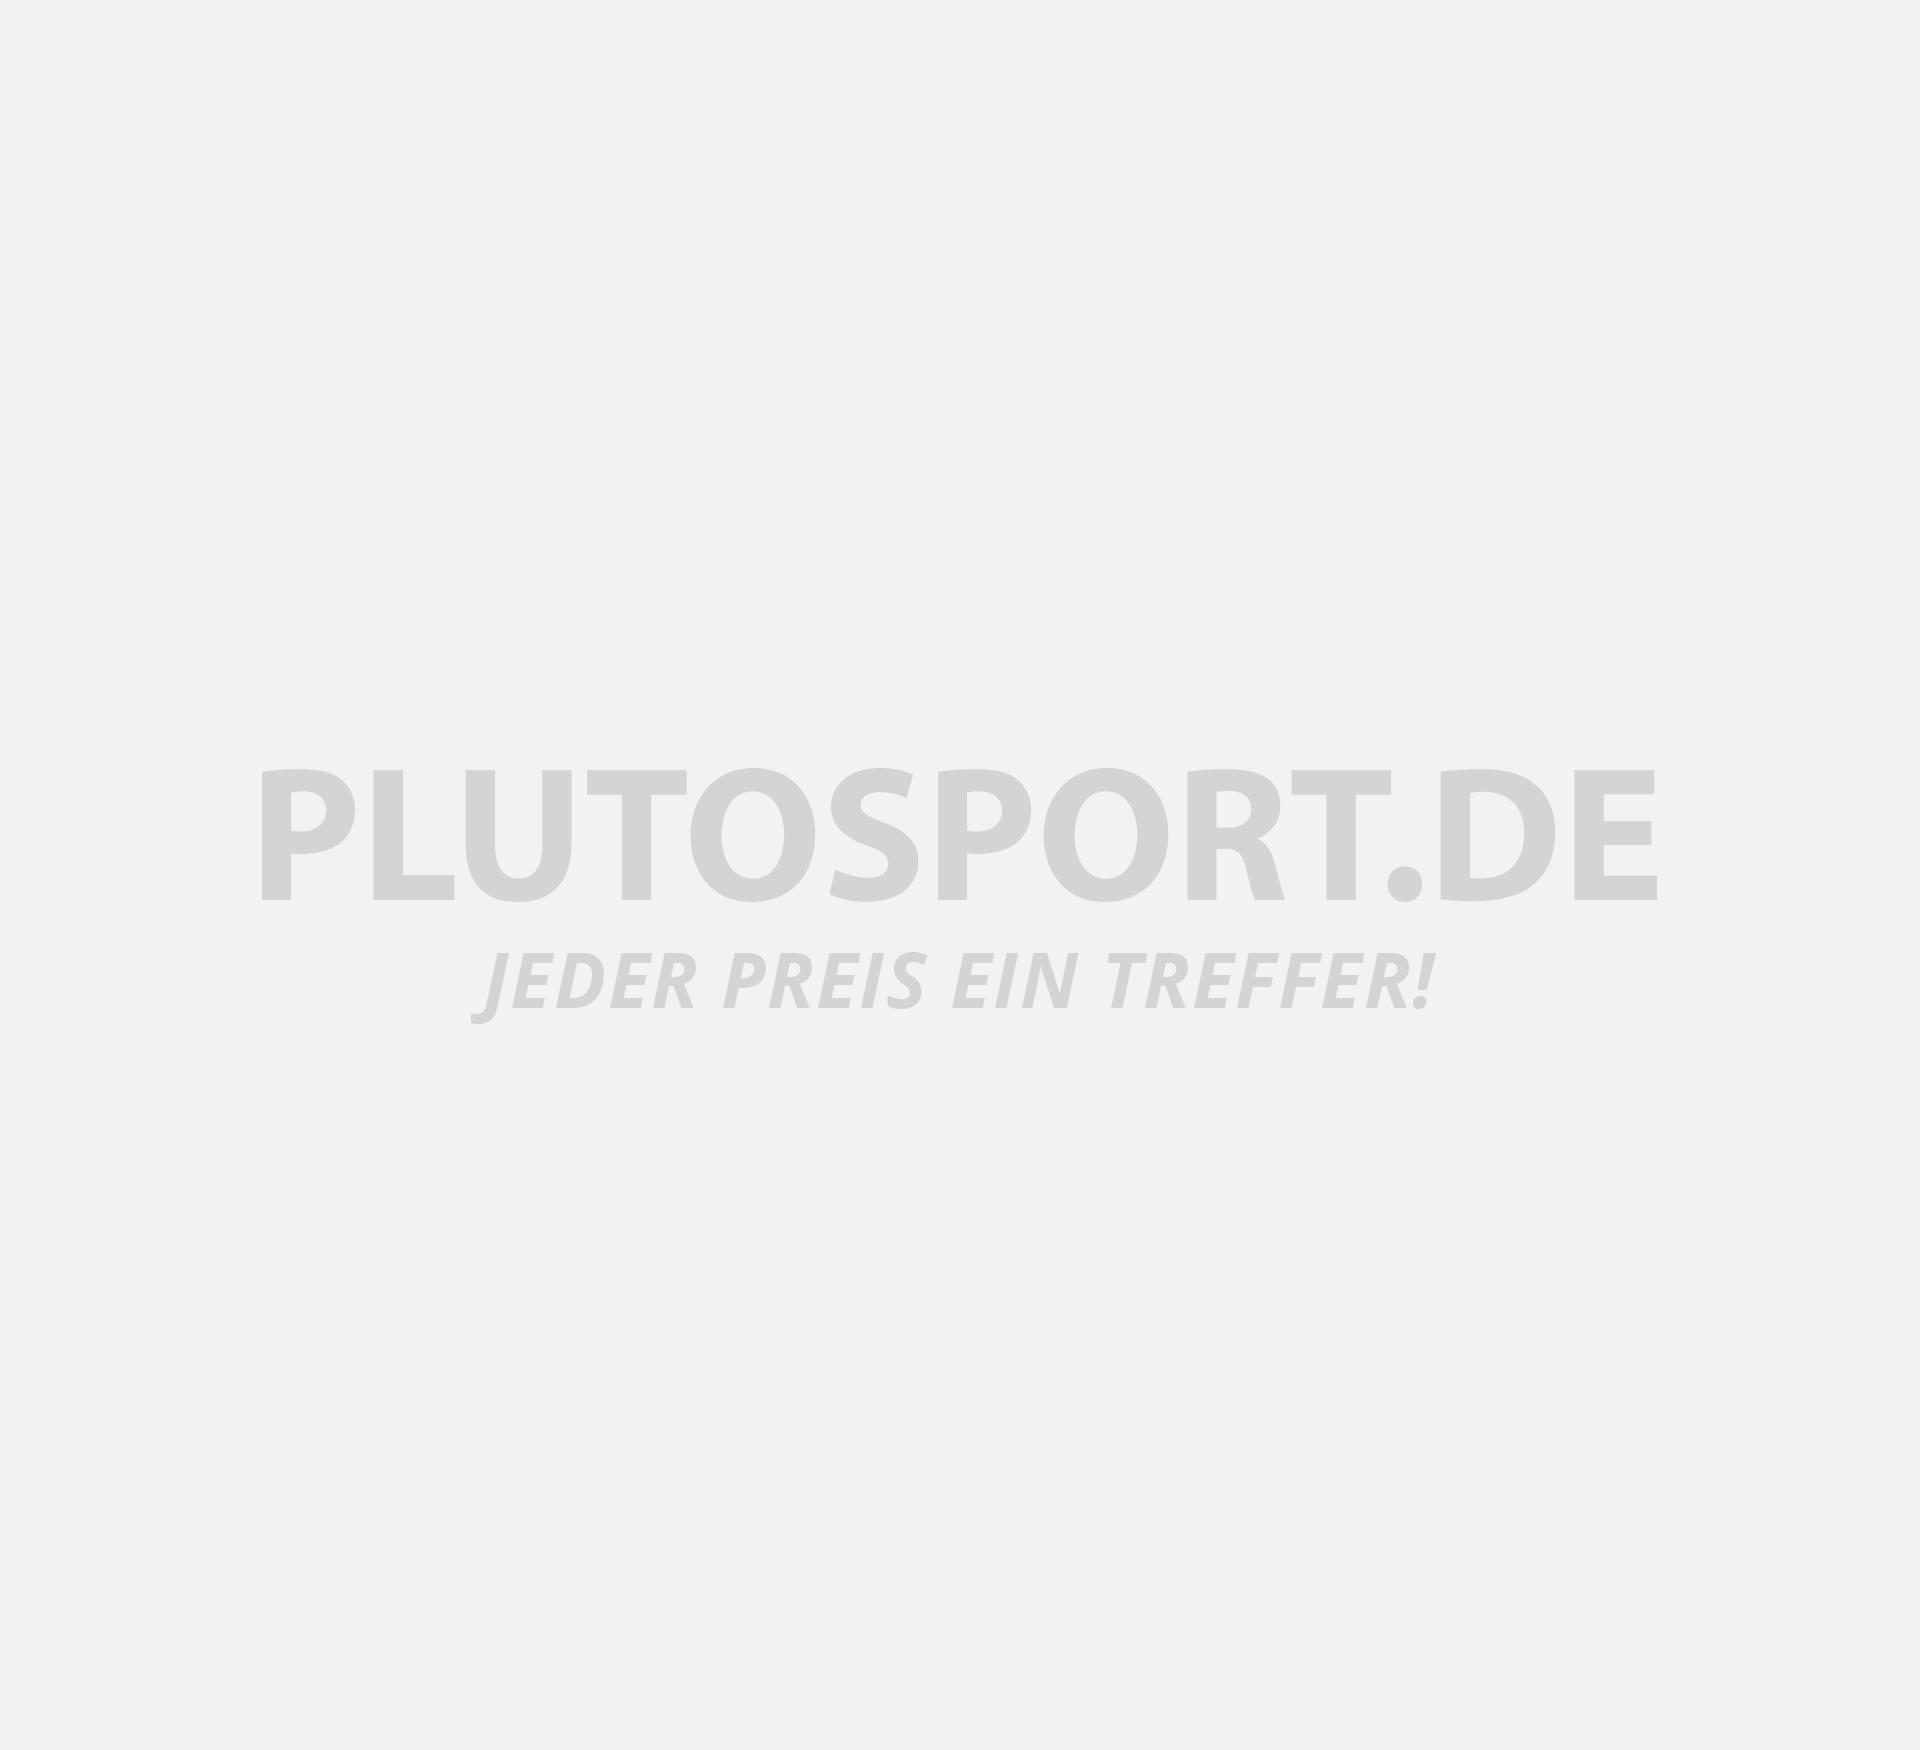 Adidas Uniforia League J350 Fußball EK 2020 Kinder